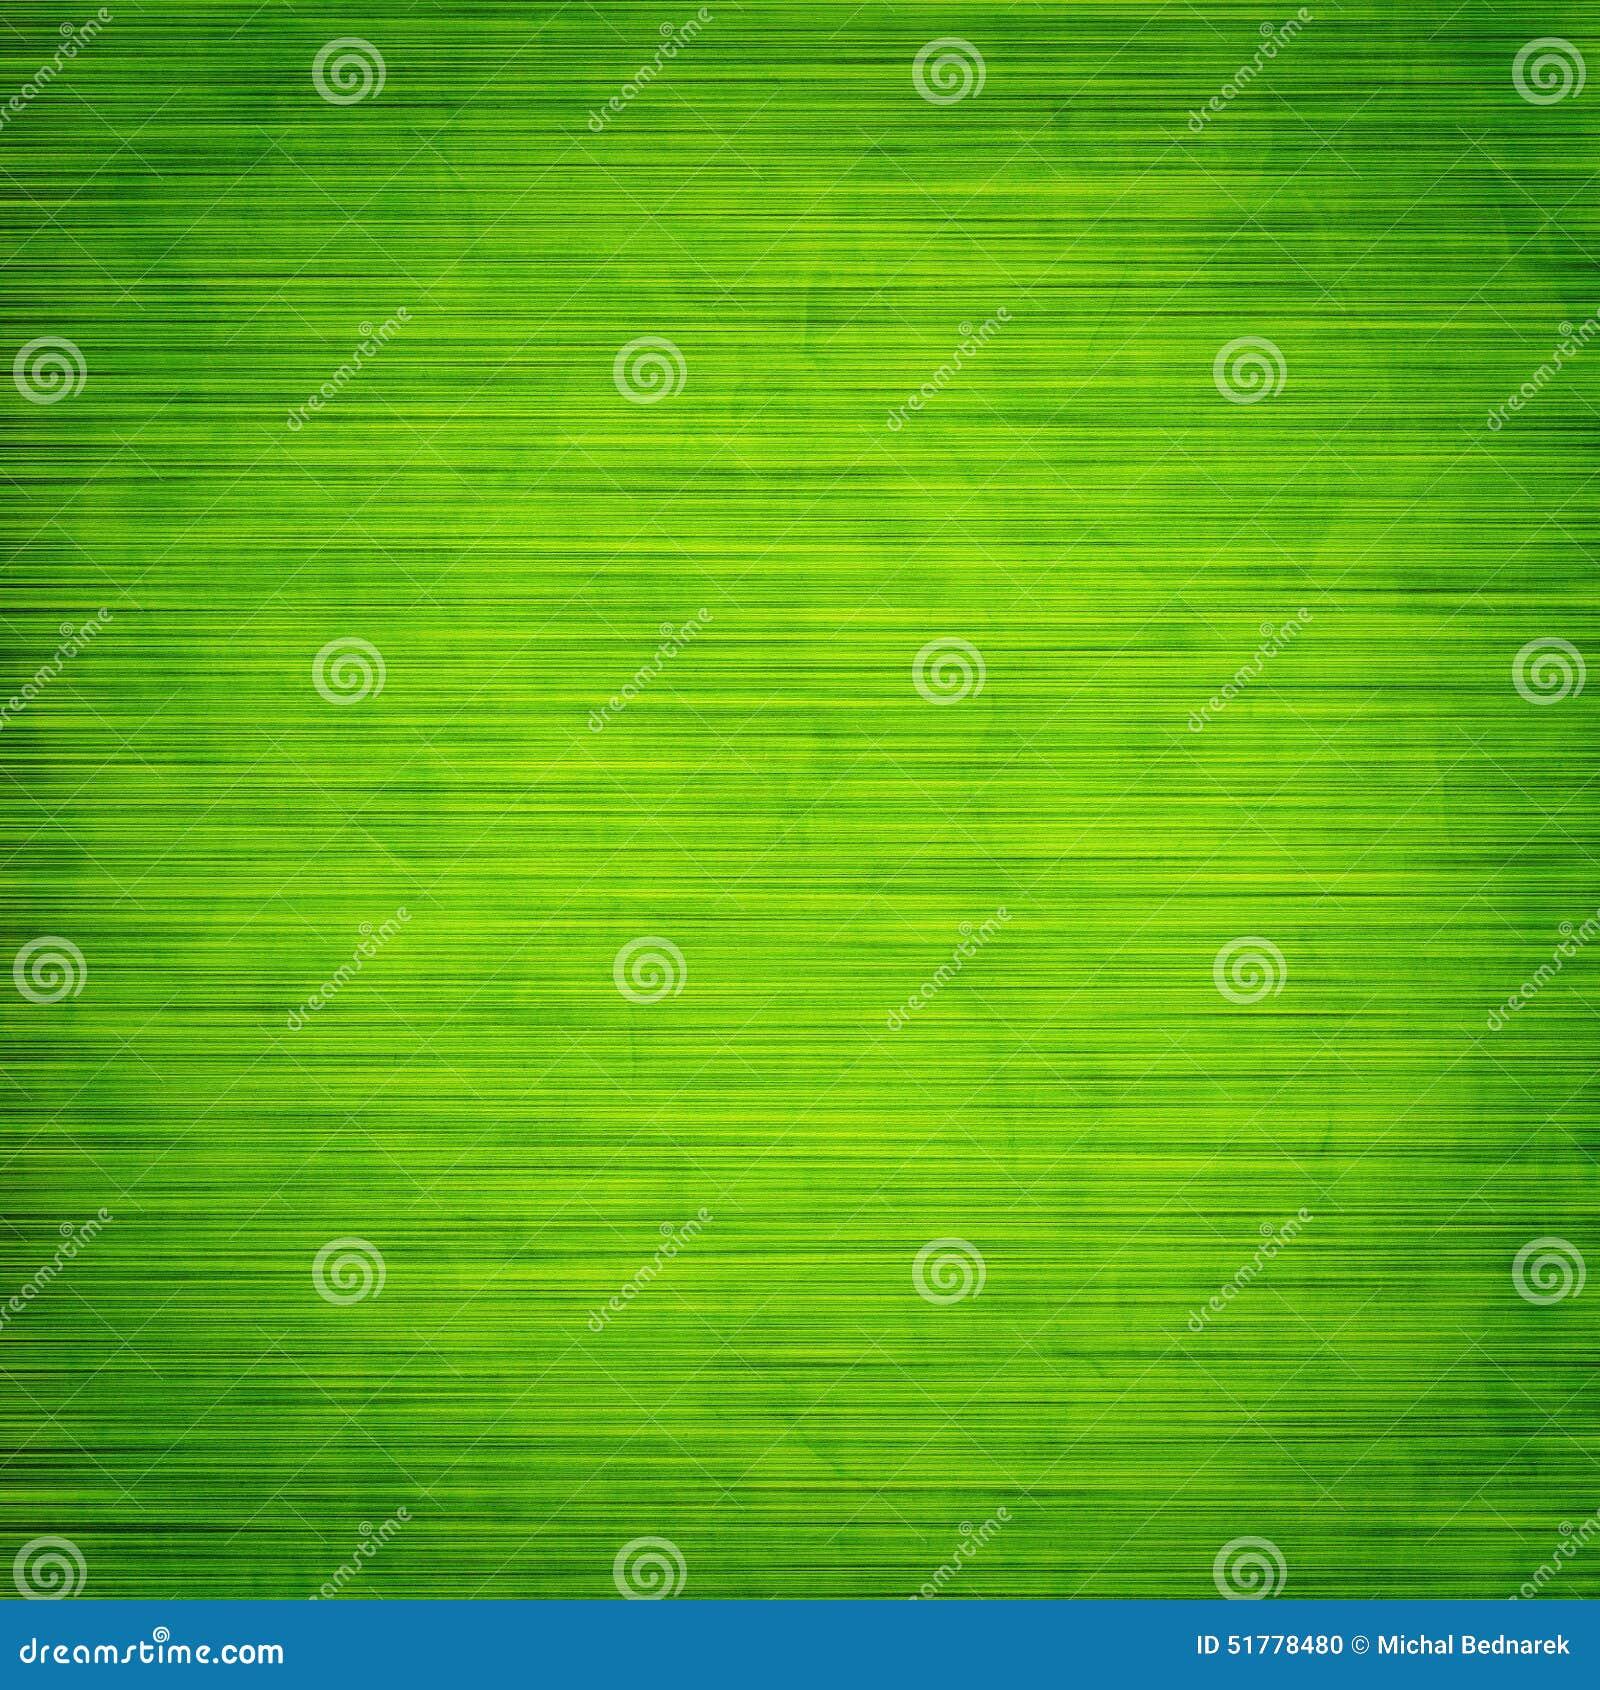 elegant green backgrounds - photo #43